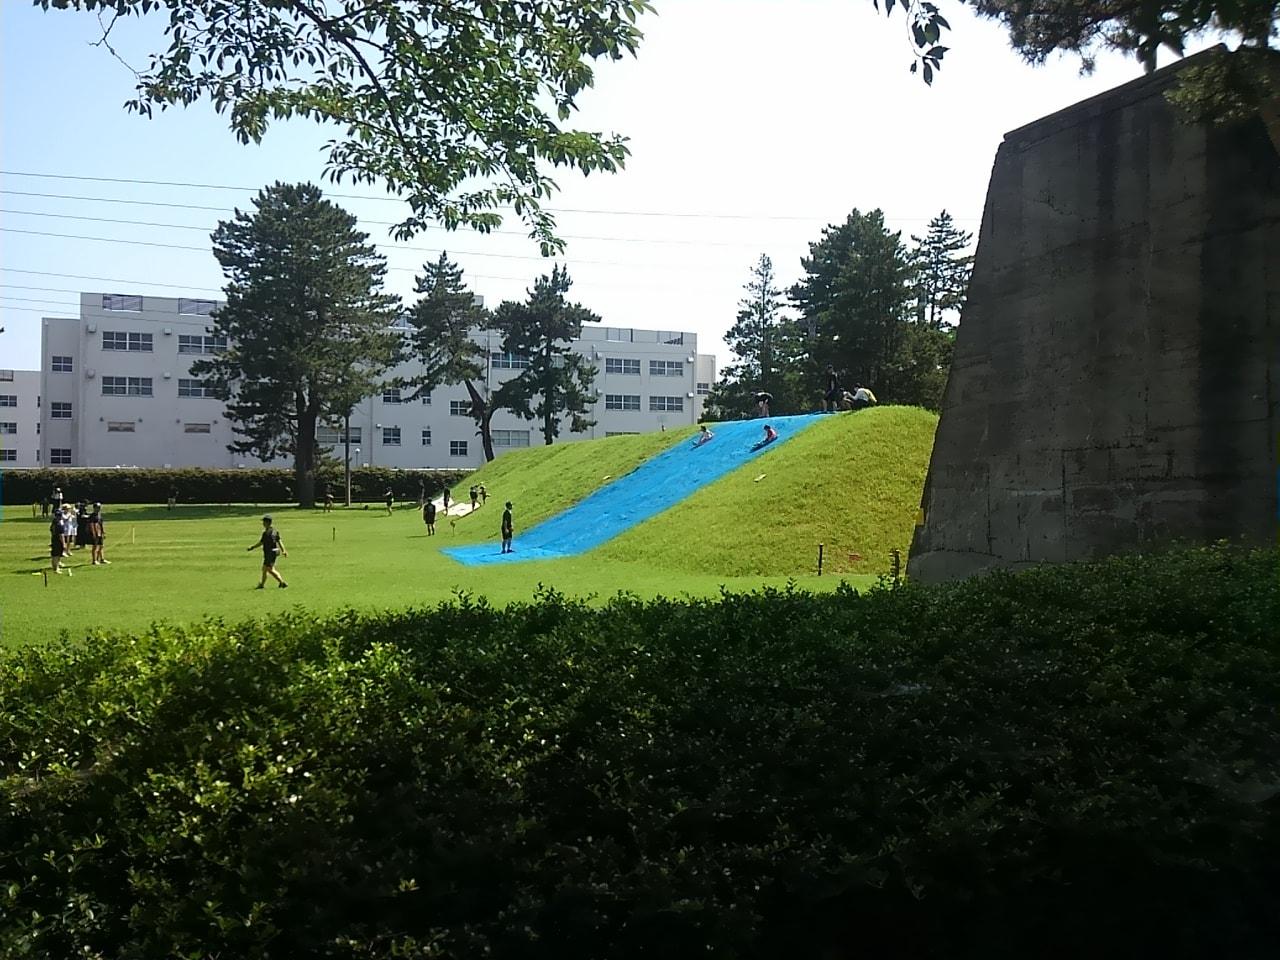 習志野駐屯地夏祭り行き方